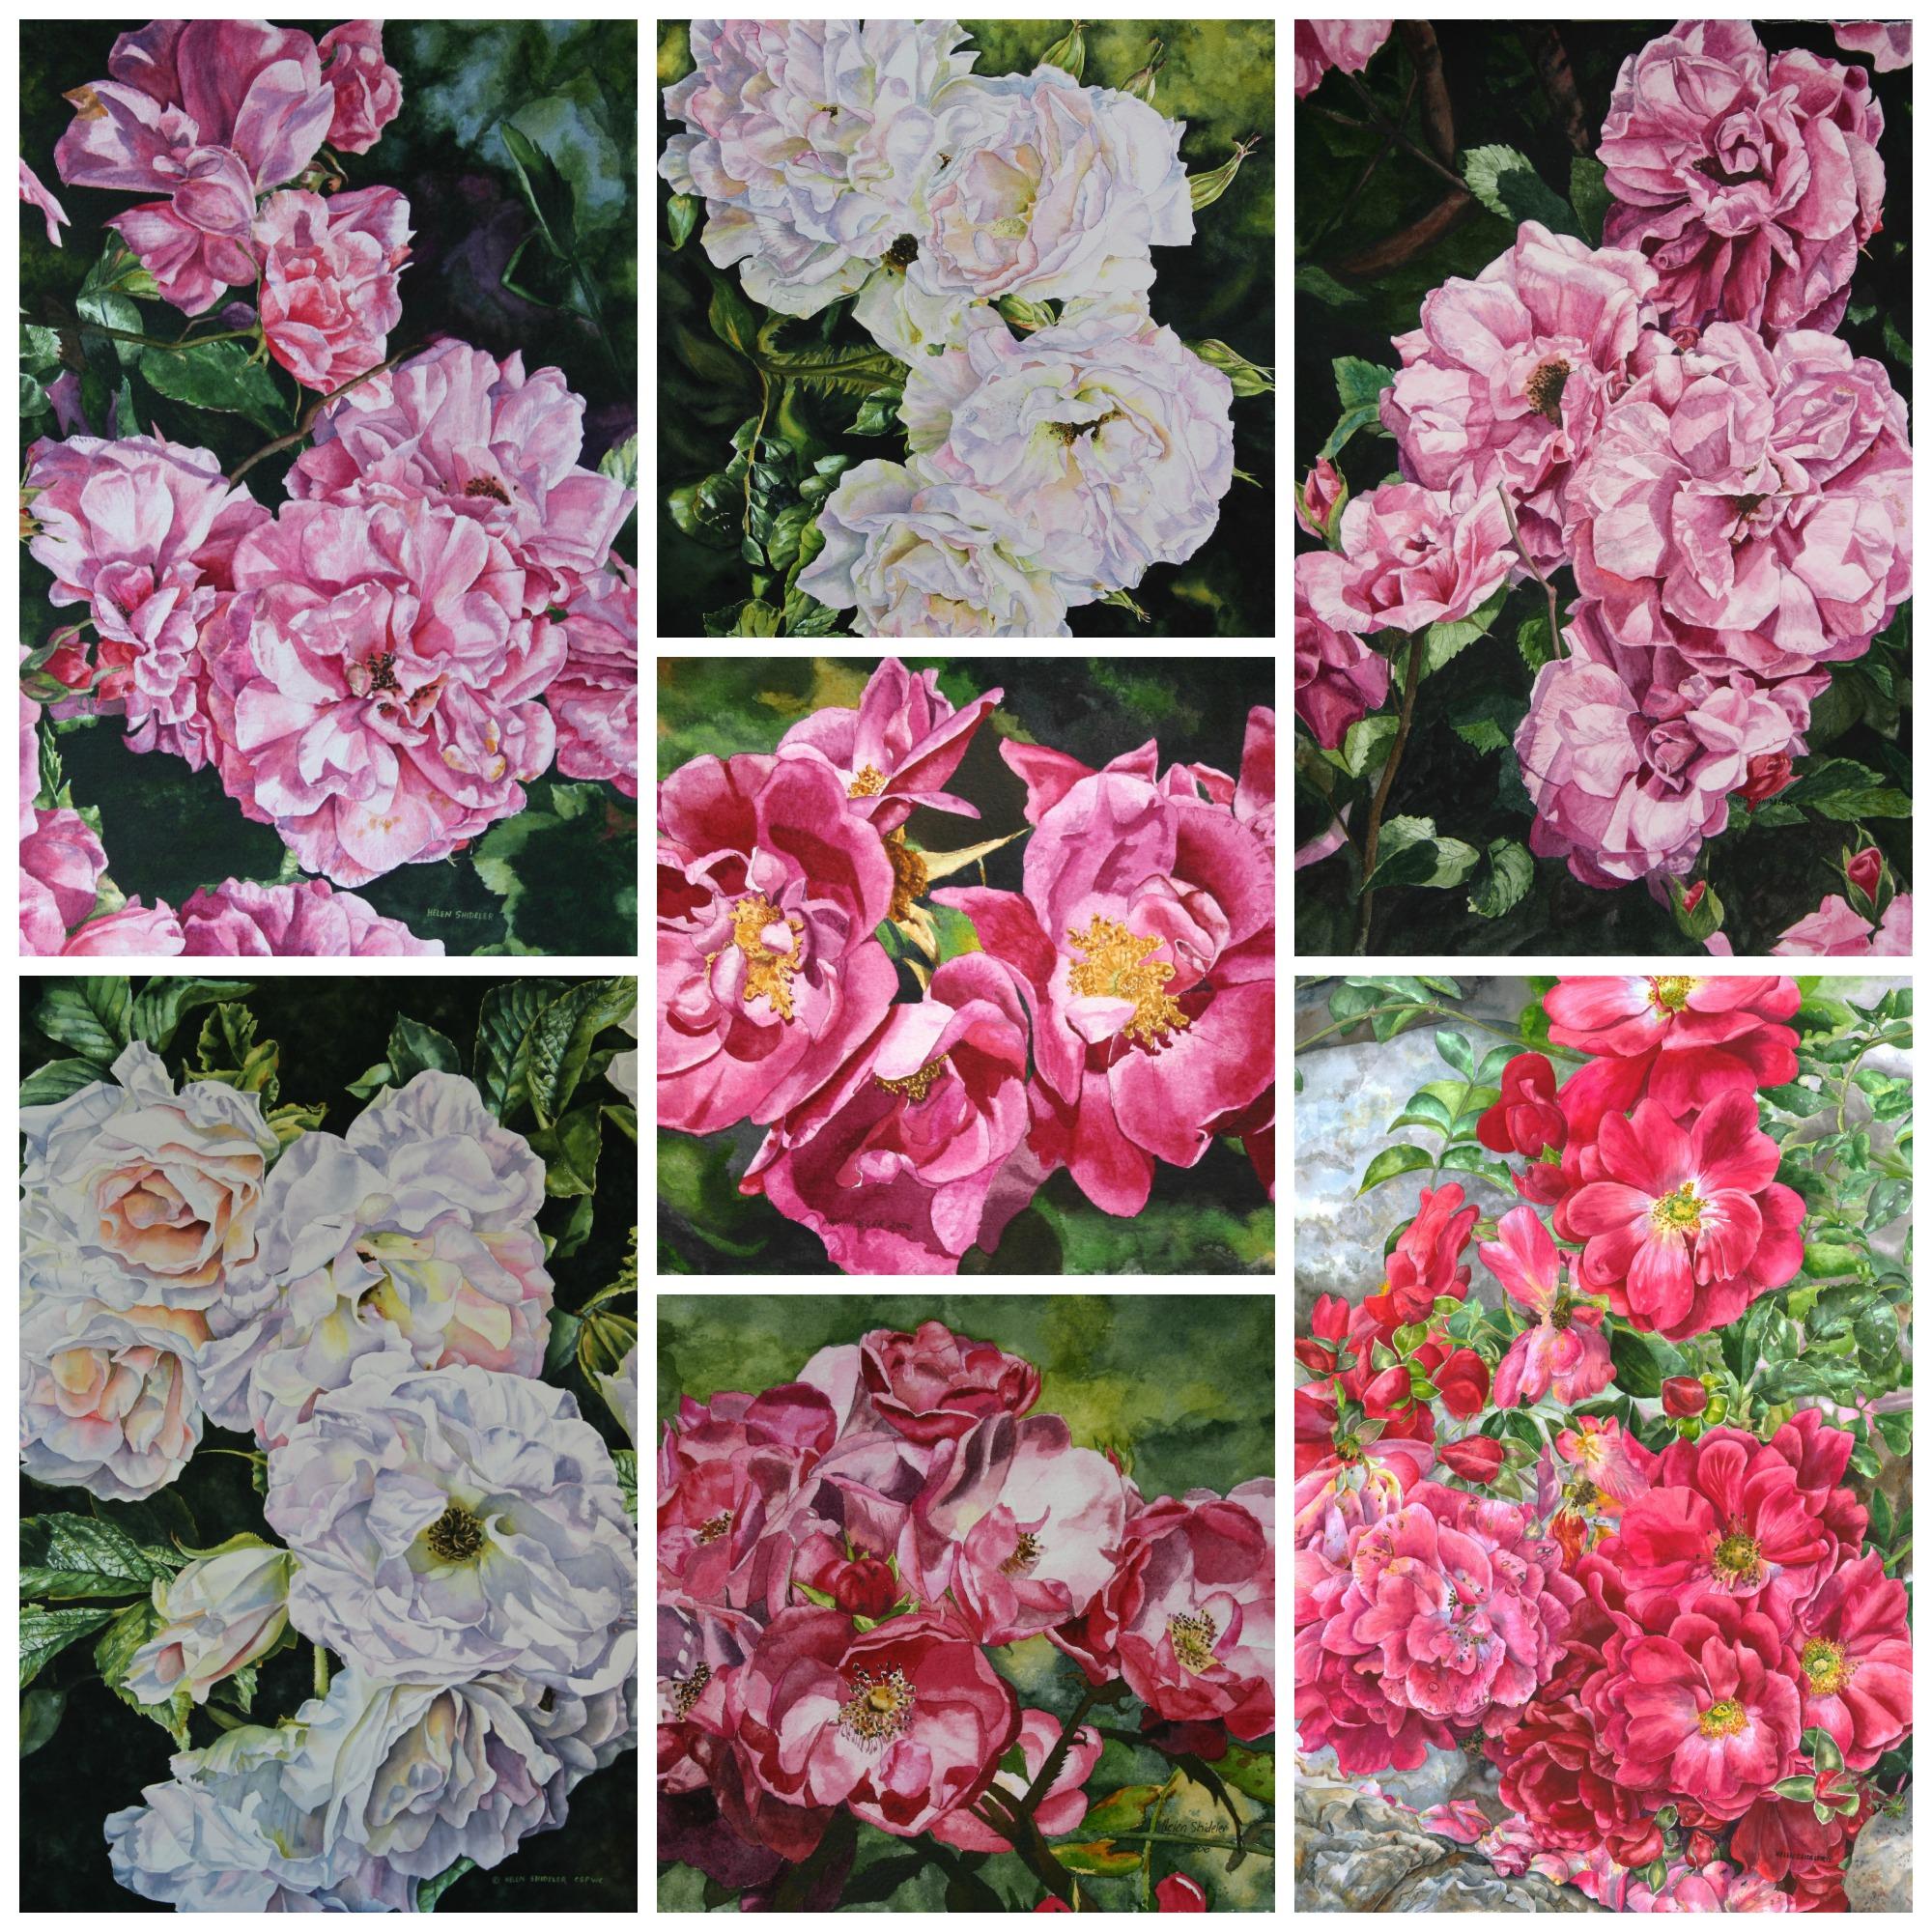 Water color roses by Helen Shideler